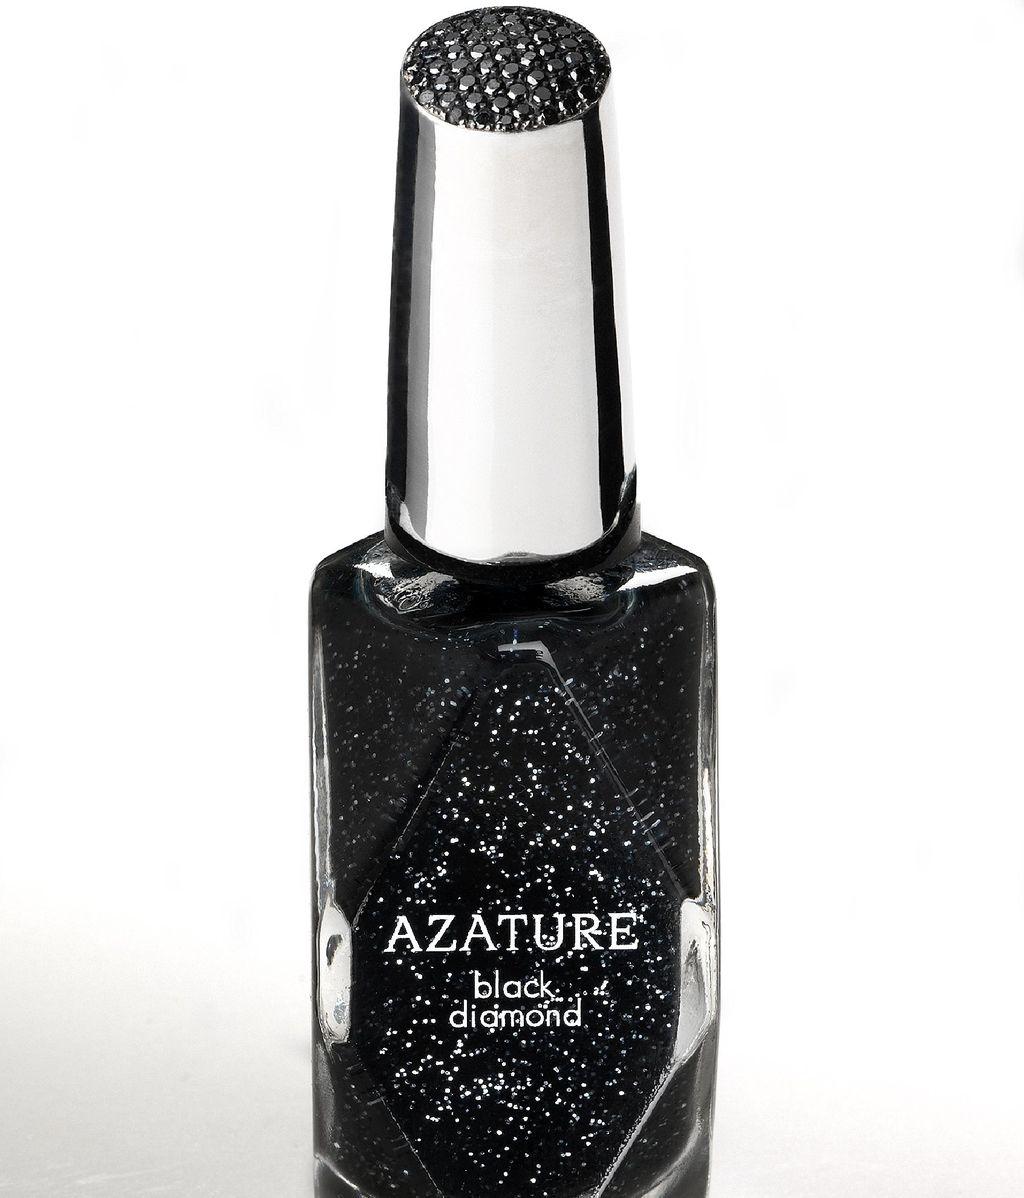 El pintauñas más caro del mundo, Azature Black Diamond